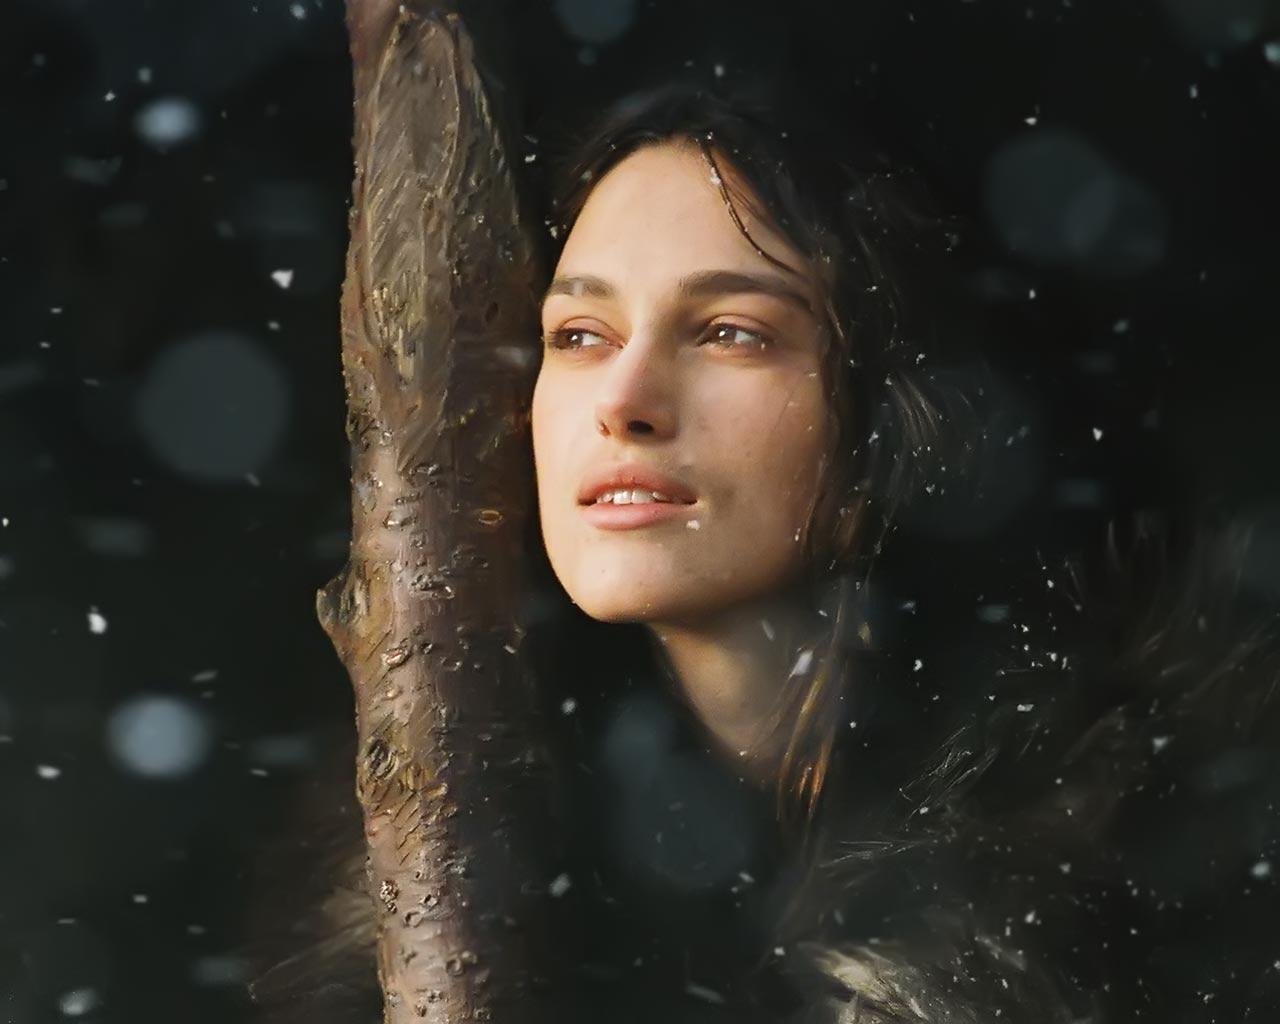 Desktop HD Wallpapers: Keira Knightley life info Keira Knightley Movies